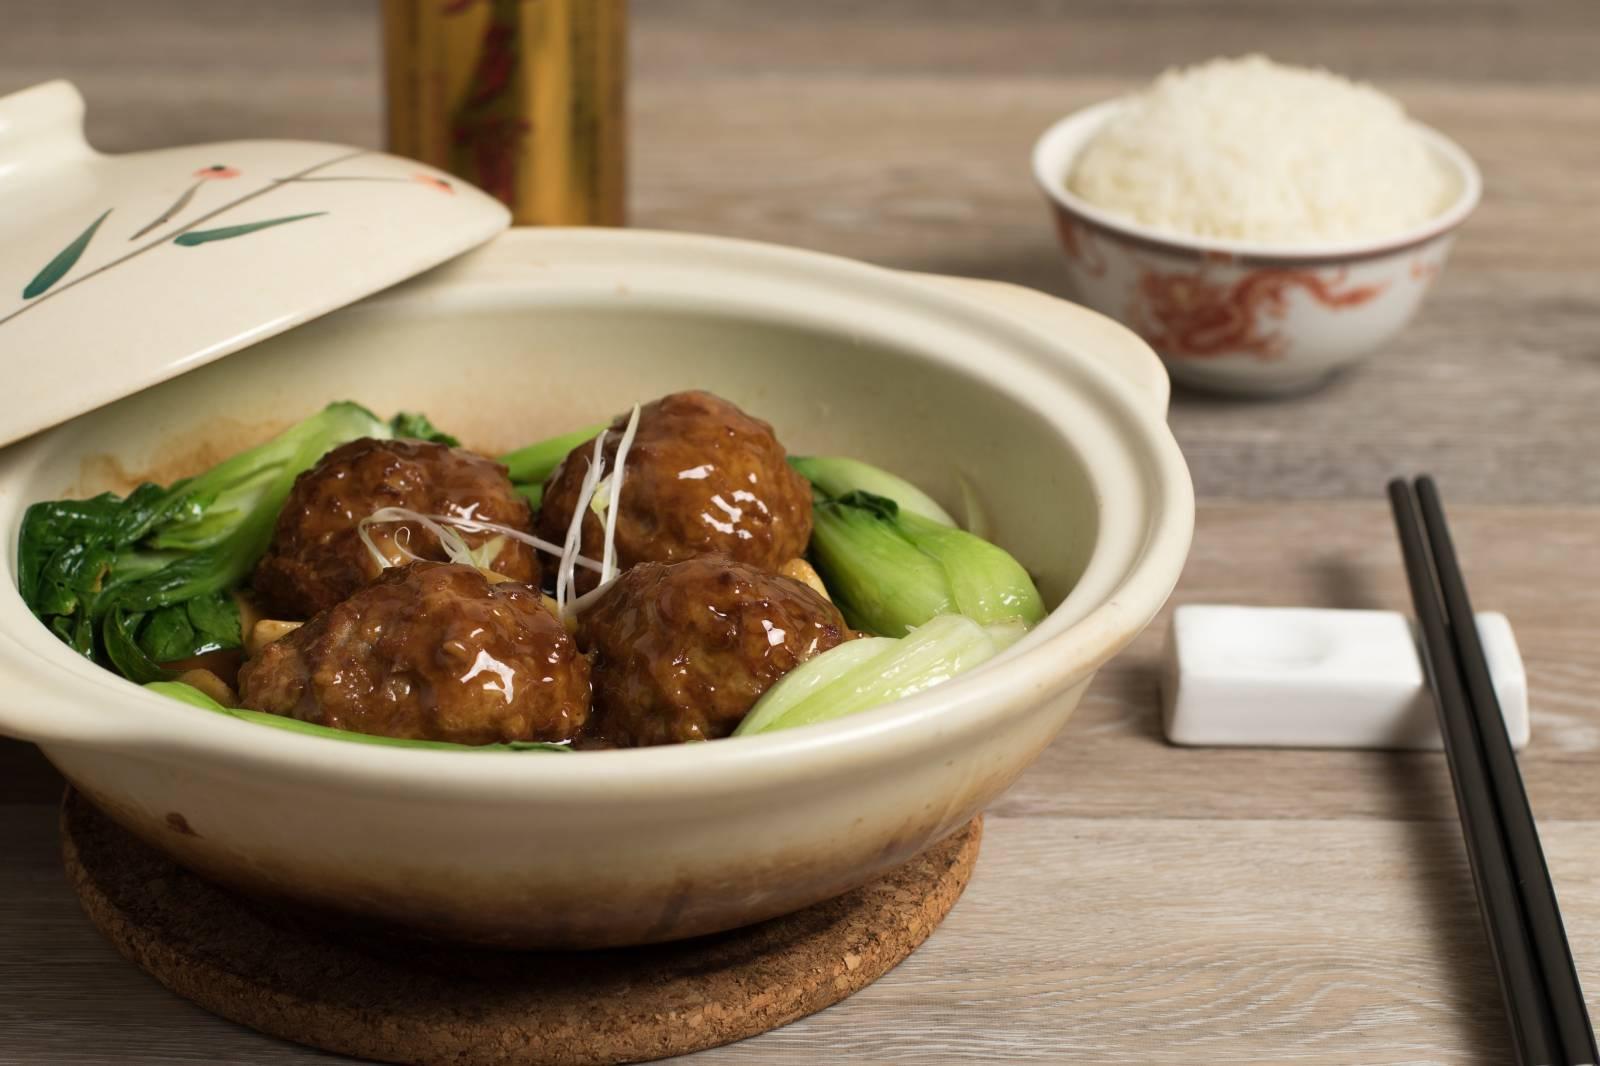 restaurant chinois gastronomique marseille restaurant jin jiang. Black Bedroom Furniture Sets. Home Design Ideas